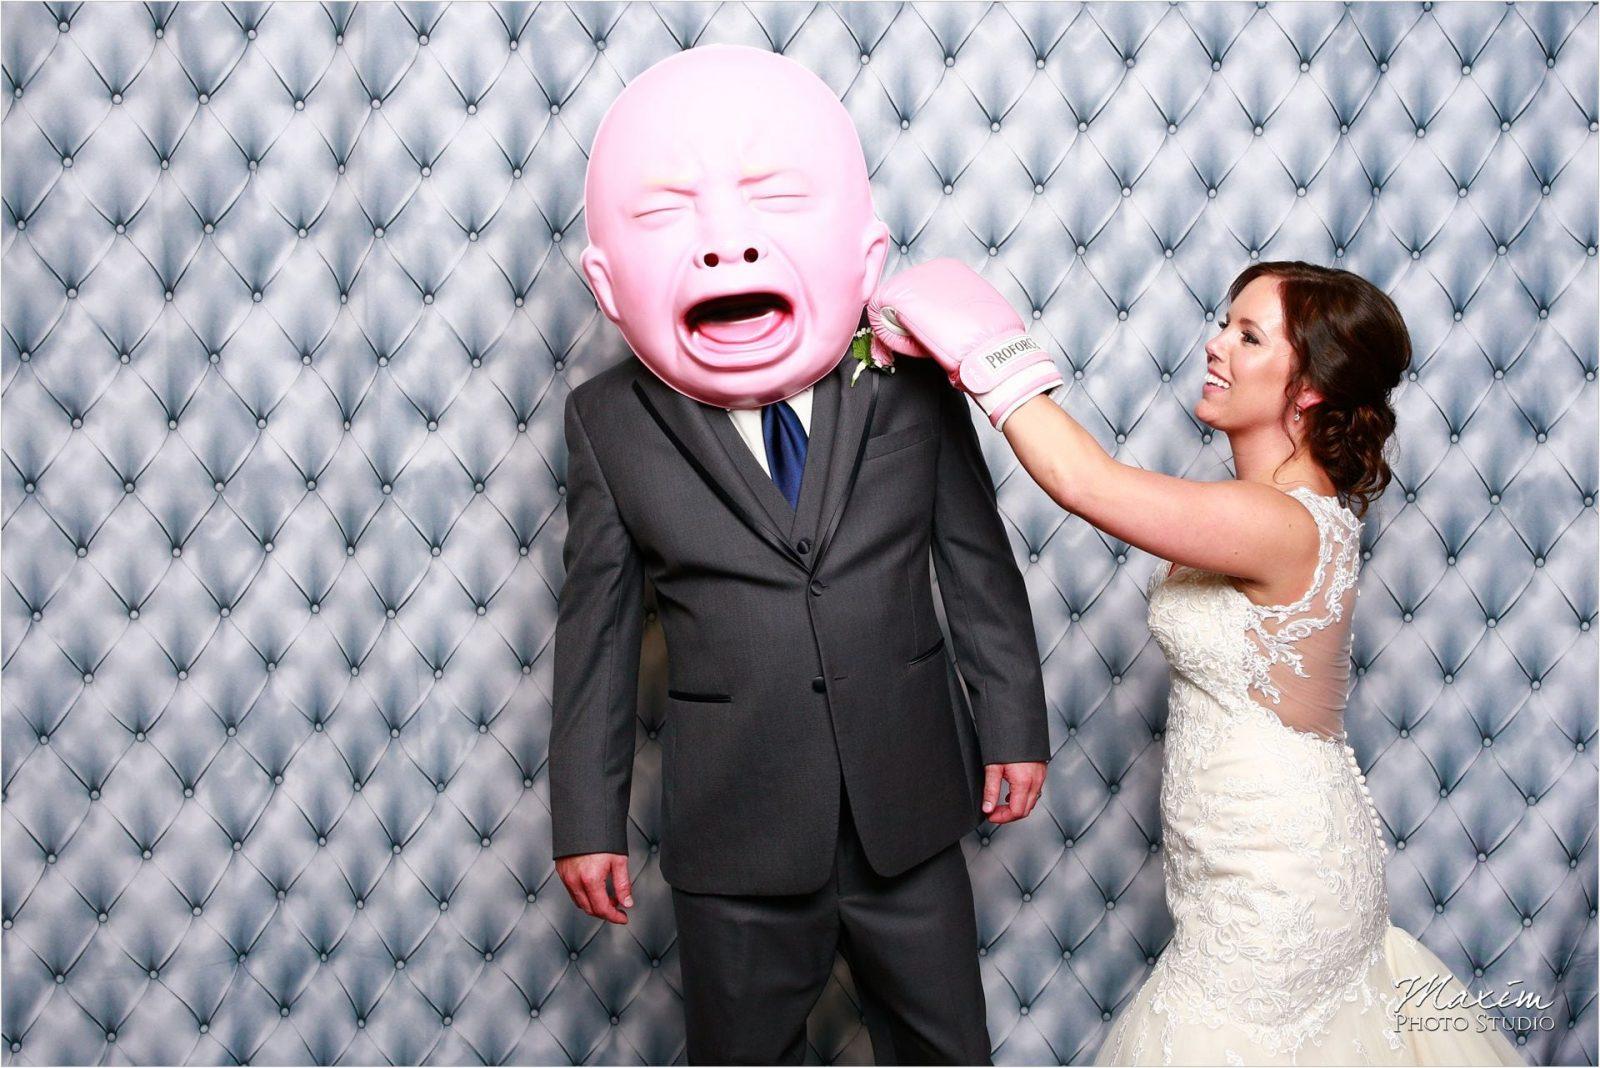 Pattison Park Wedding Reception Photo Booth